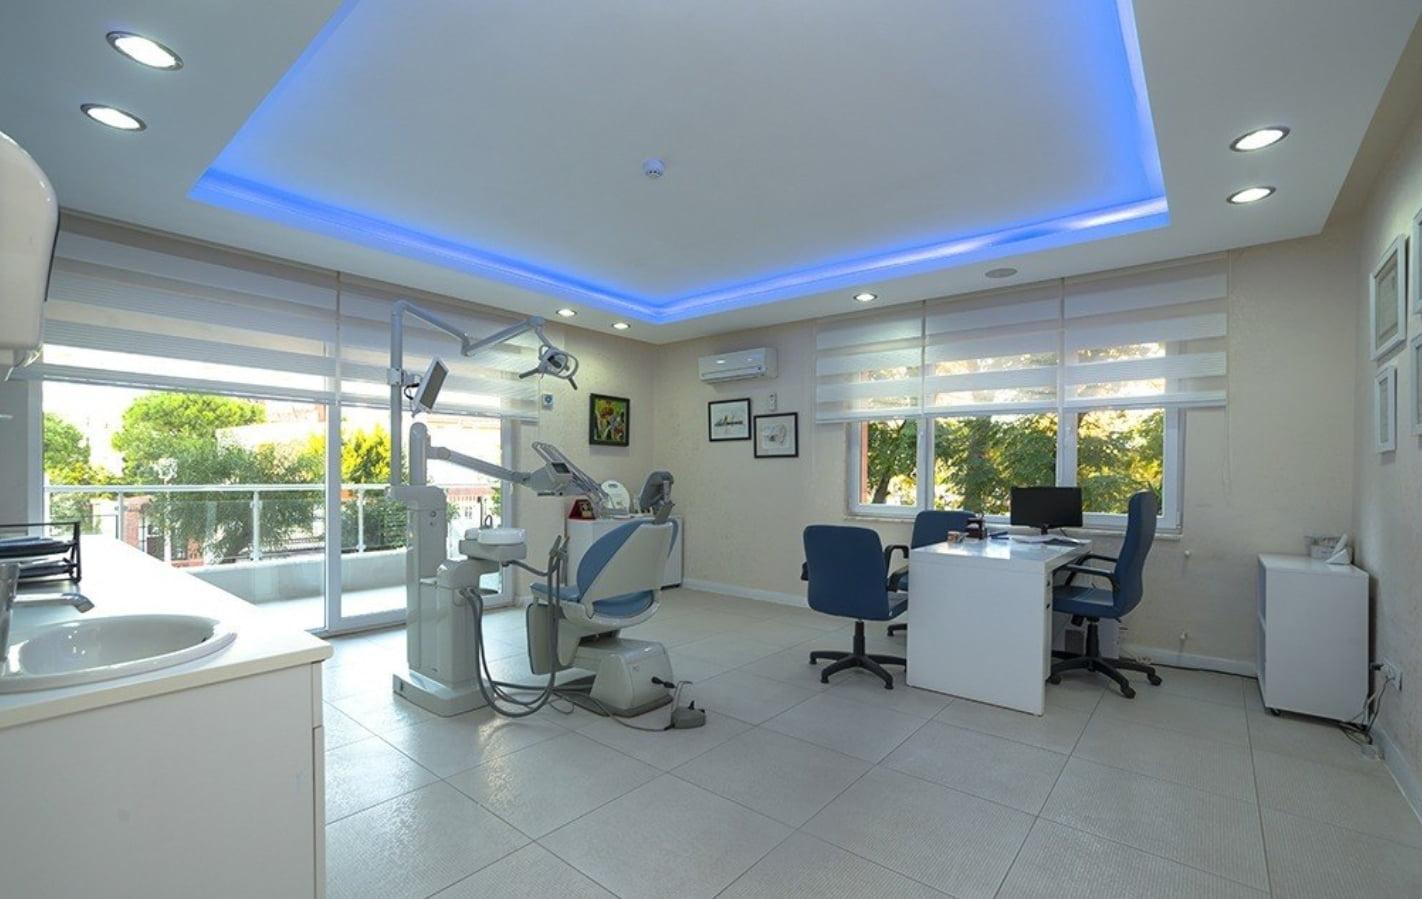 klinik5